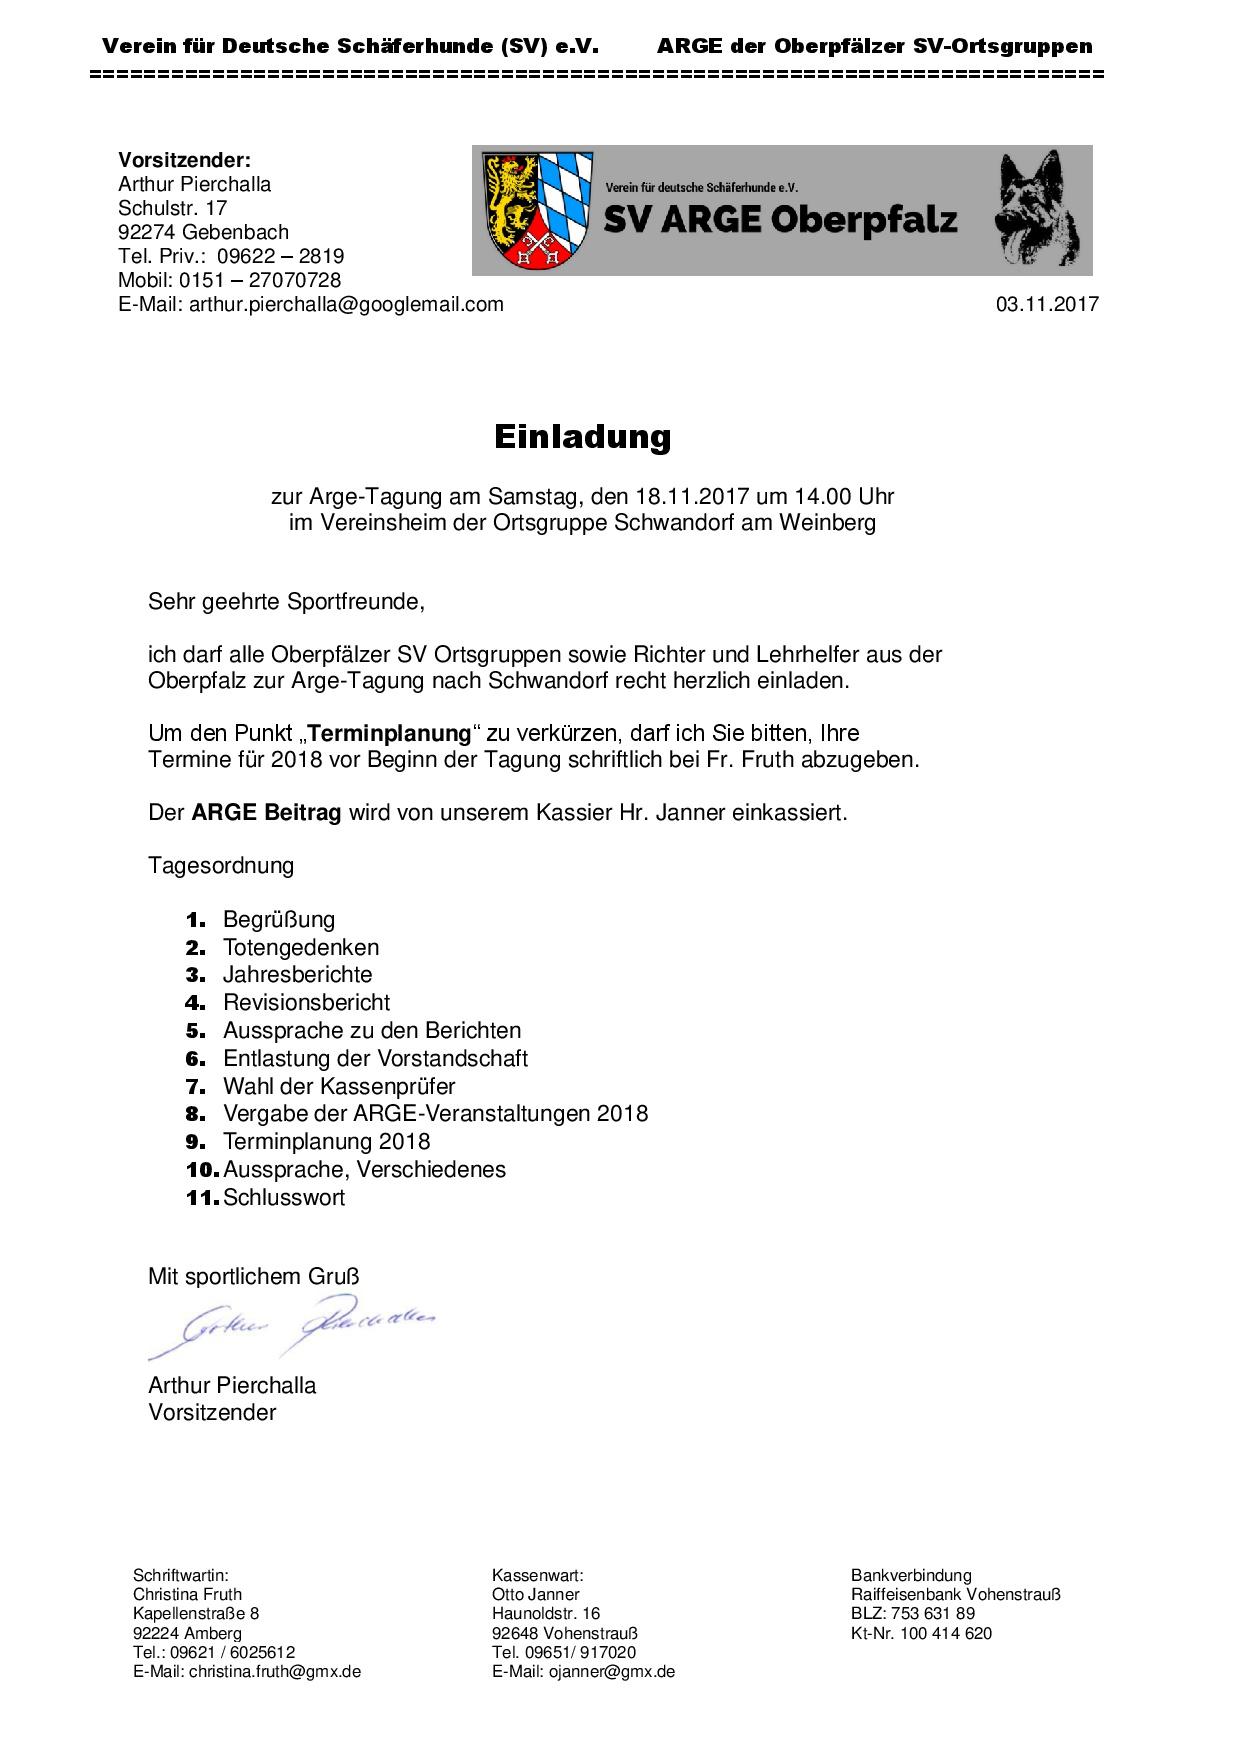 Einladung ARGE Tagung – SV ARGE Oberpfalz